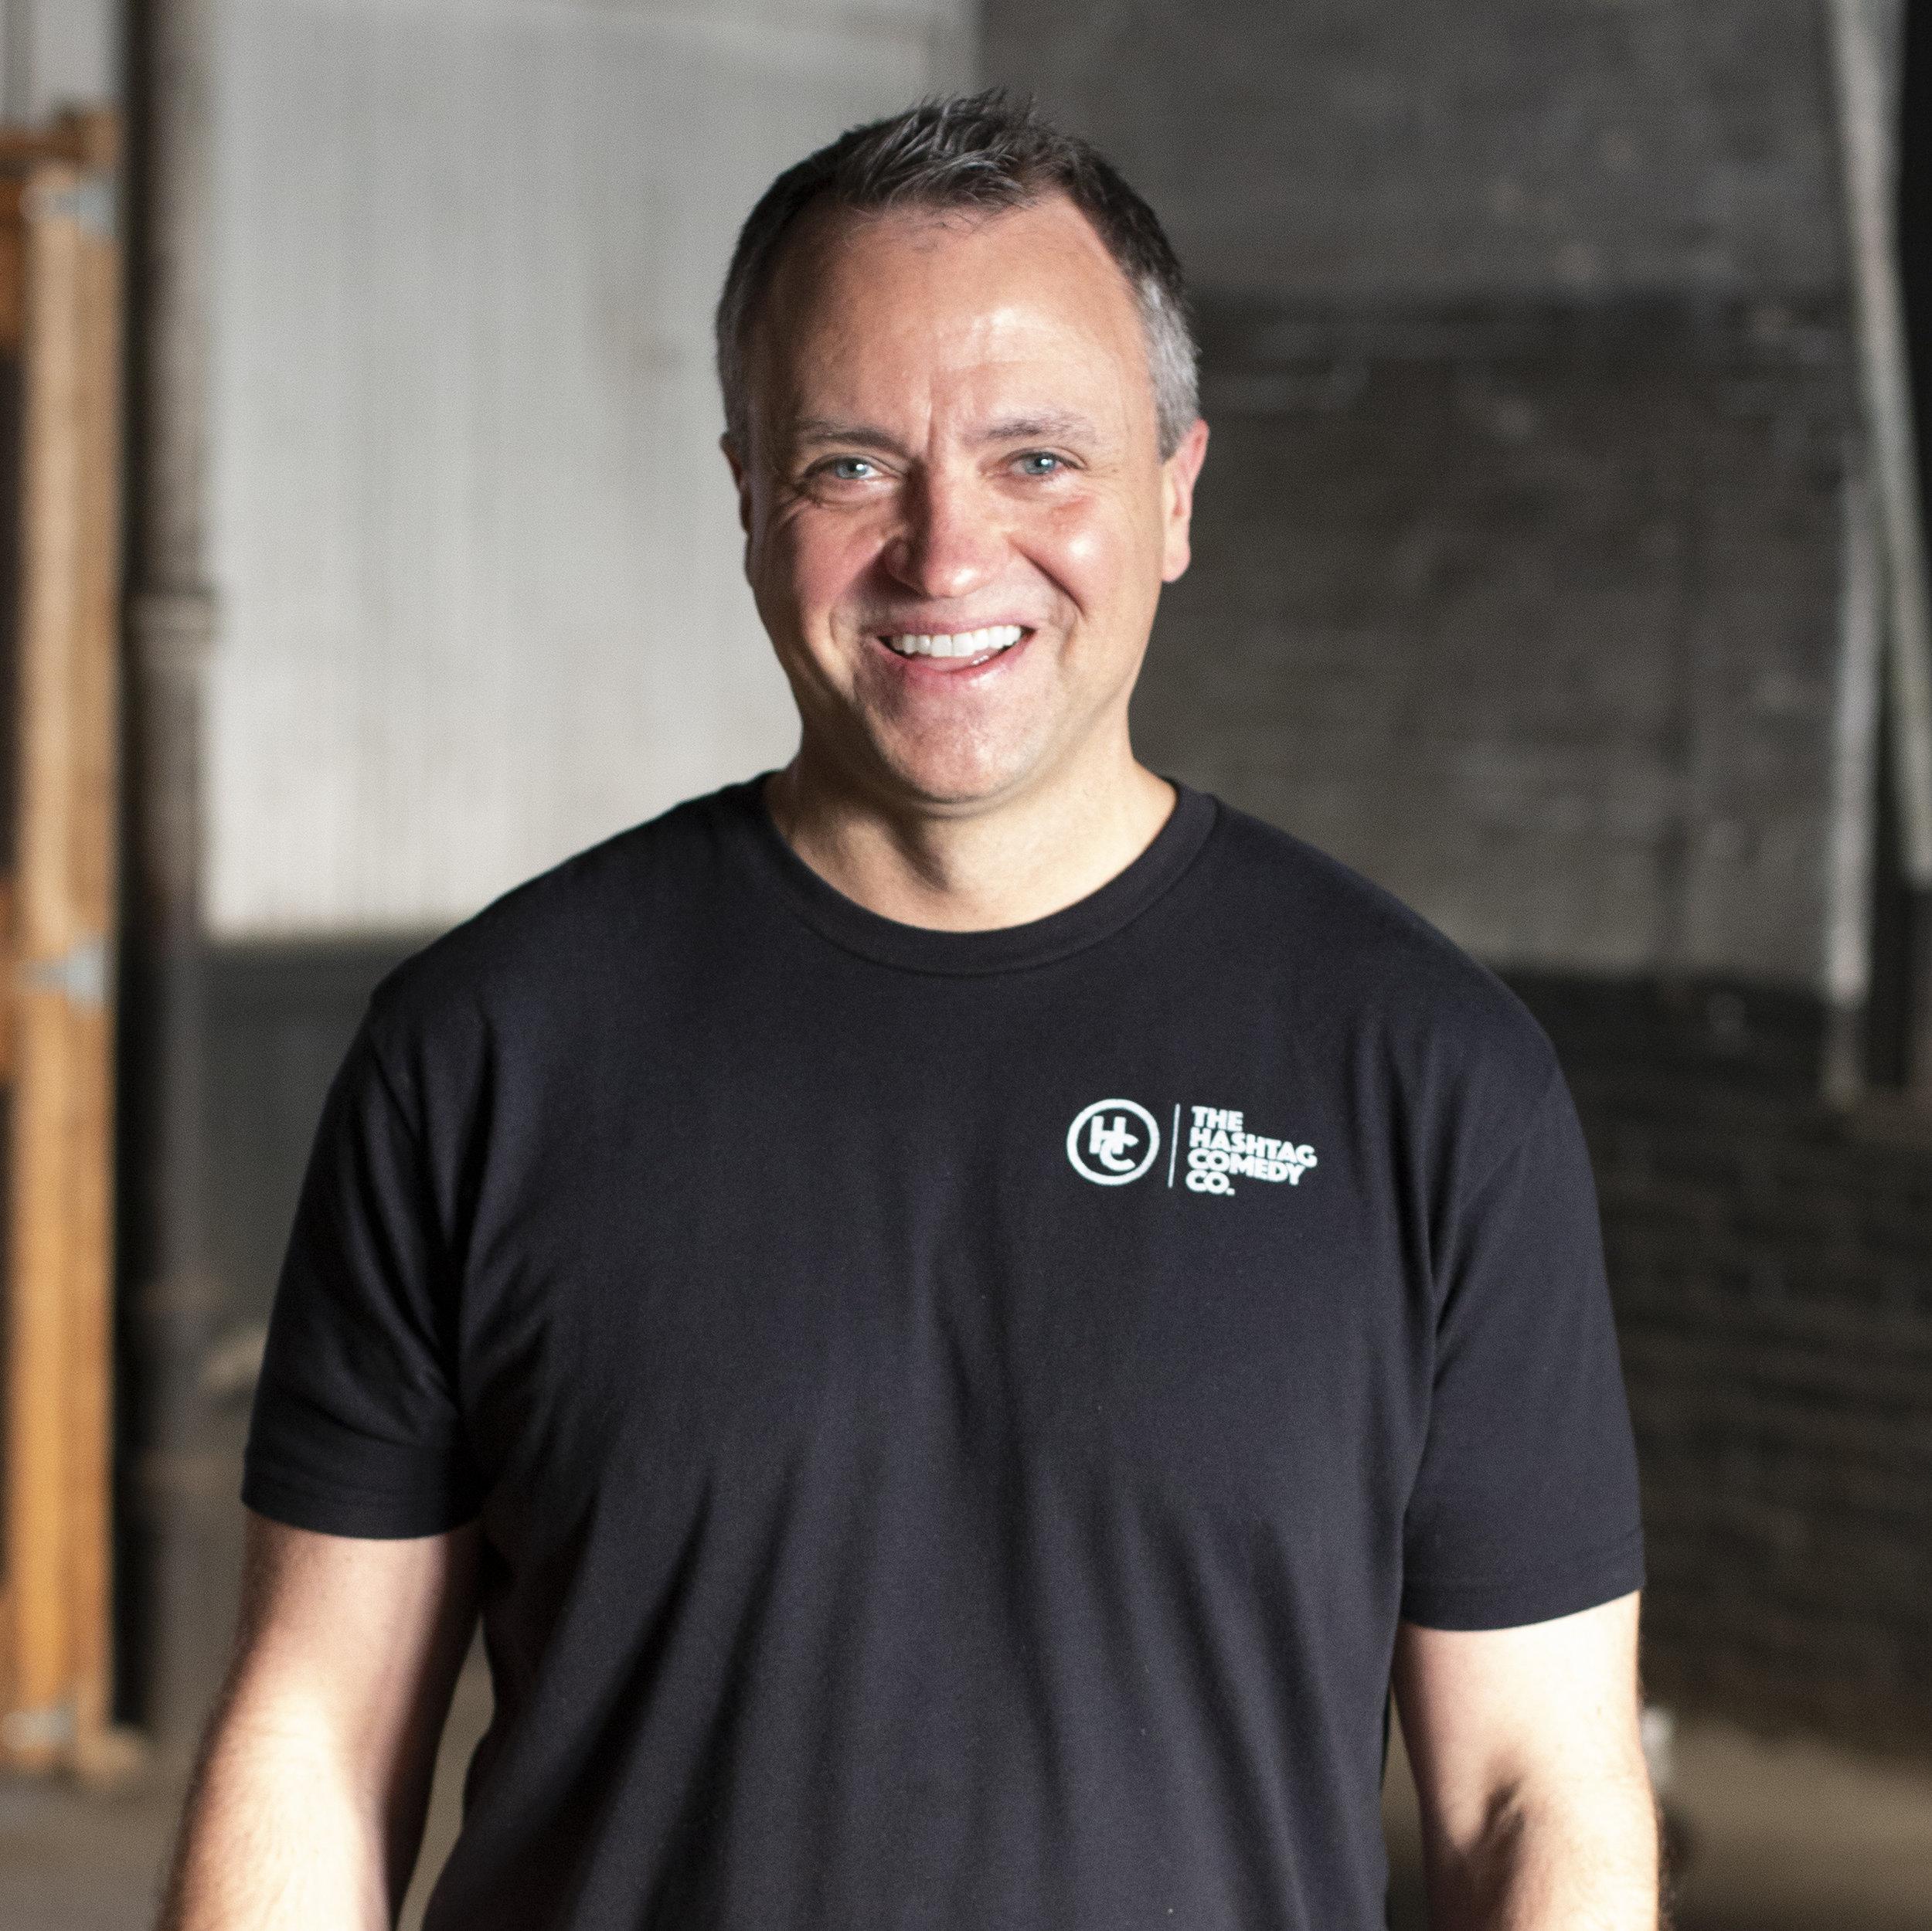 Paul Stelzer, Community Outreach Director